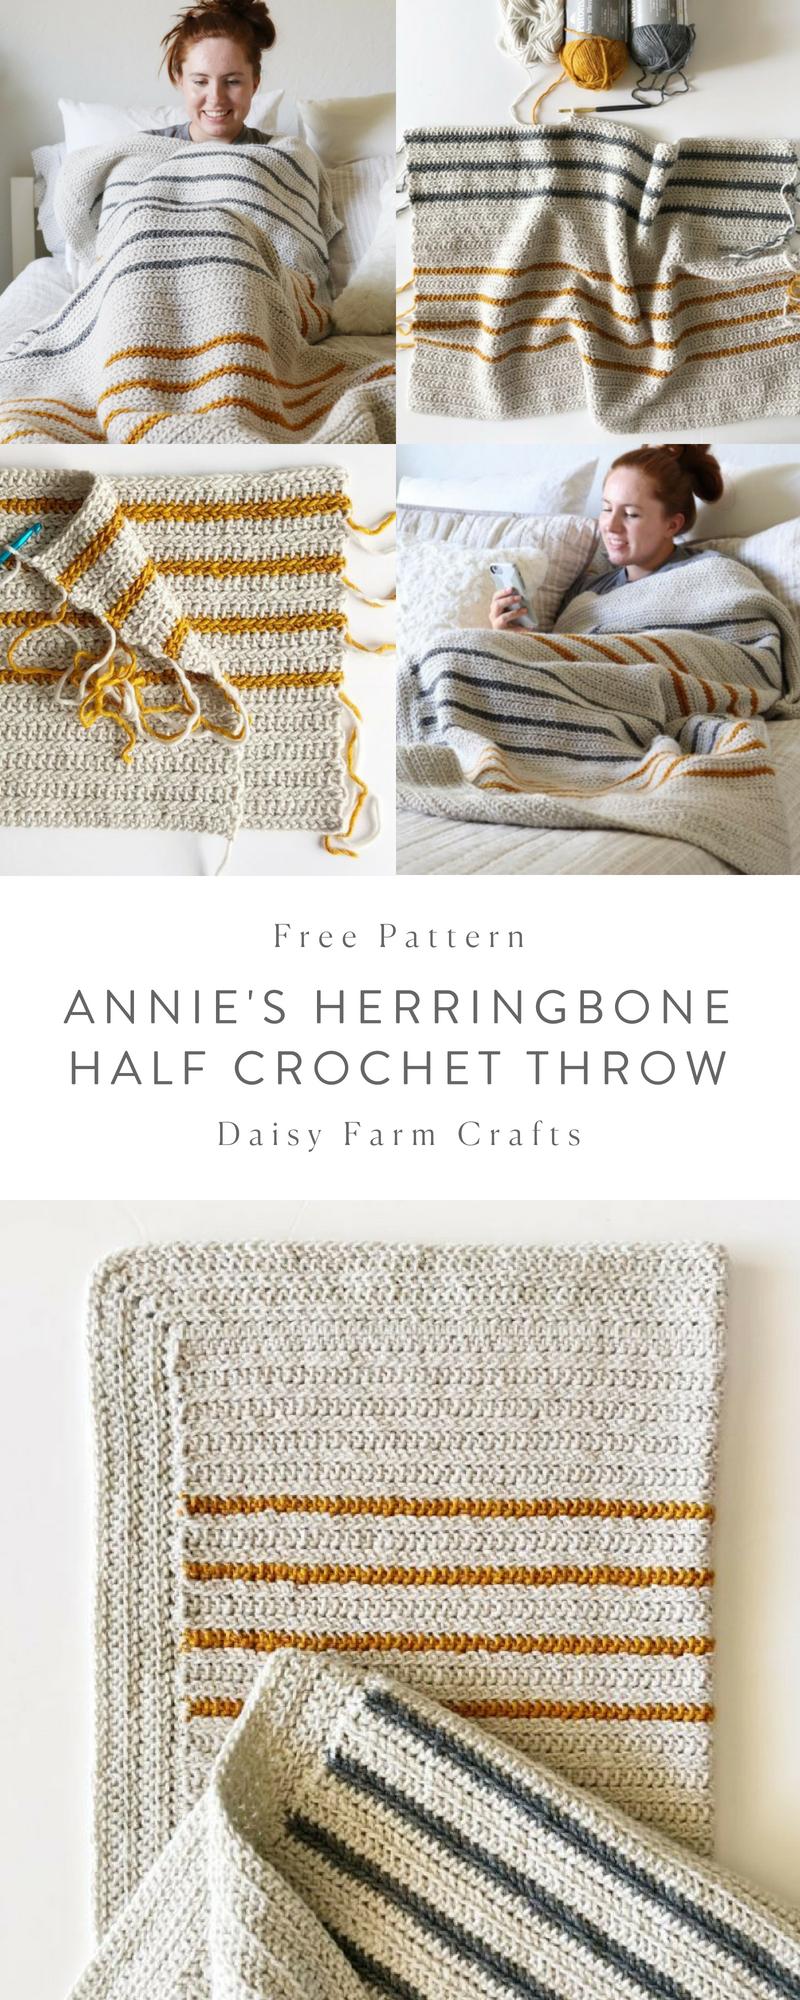 Free Pattern - Annie\'s Herringbone Half Crochet Throw | CROCHET ...